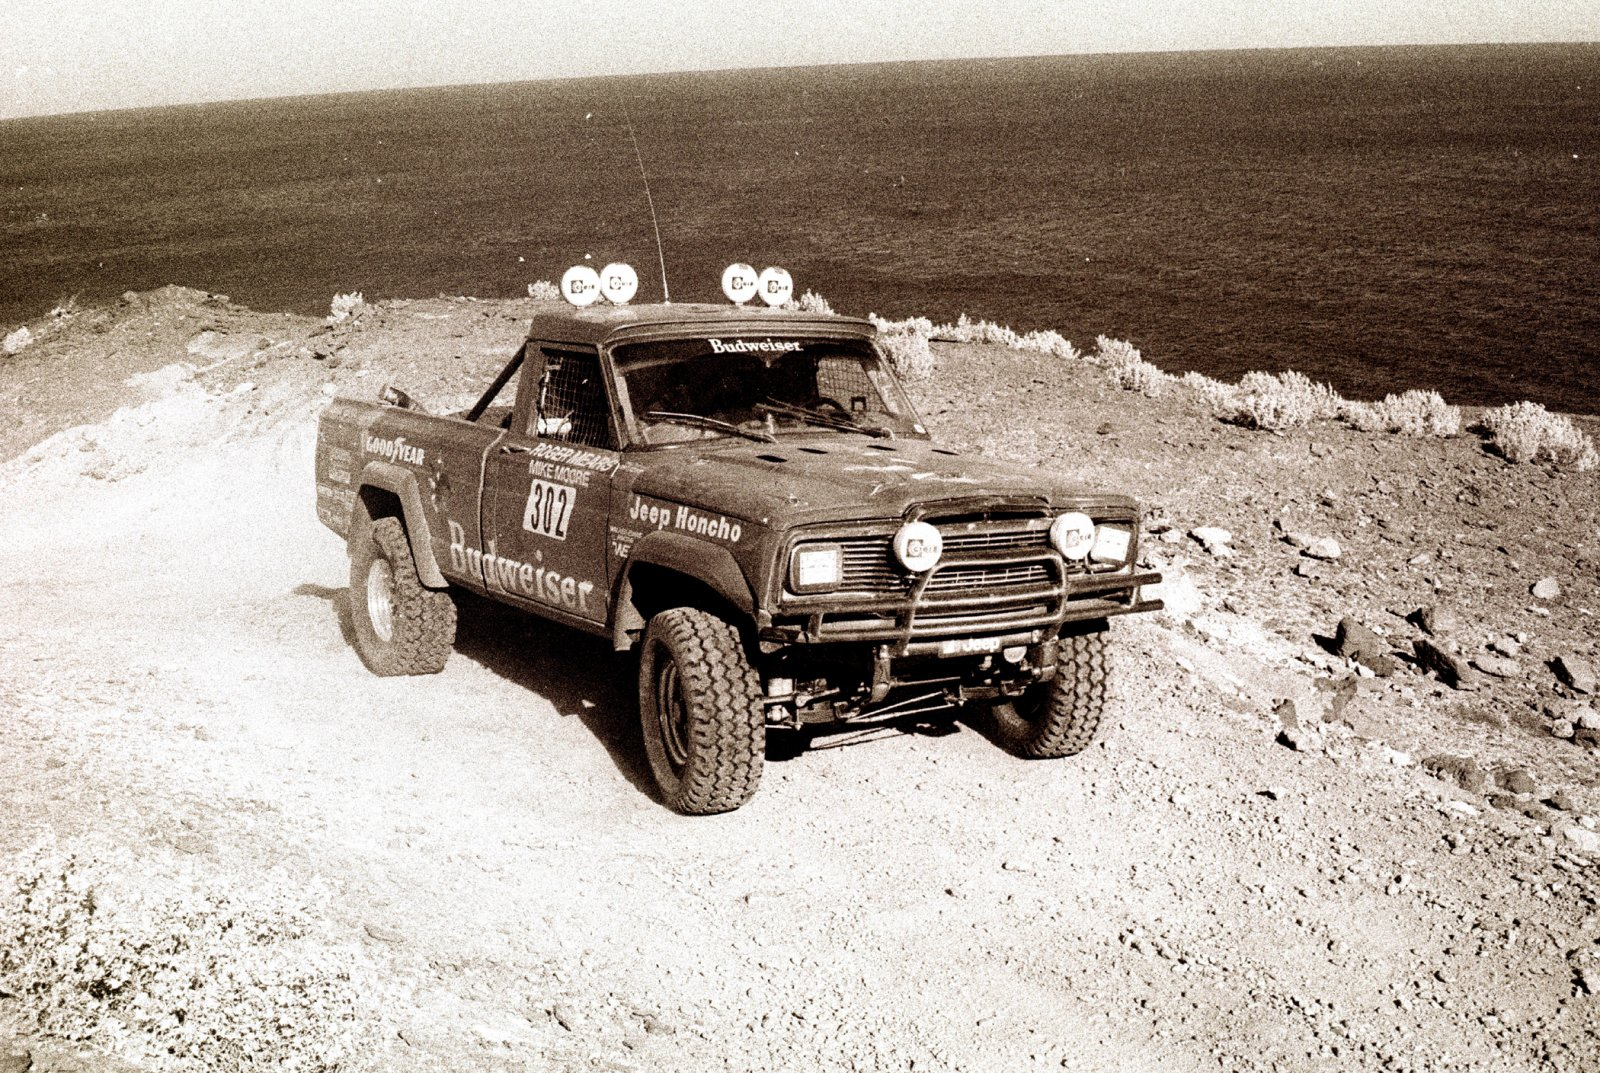 1979.Baja 1000. 302. Mears. 1st class.01.21x.jpg